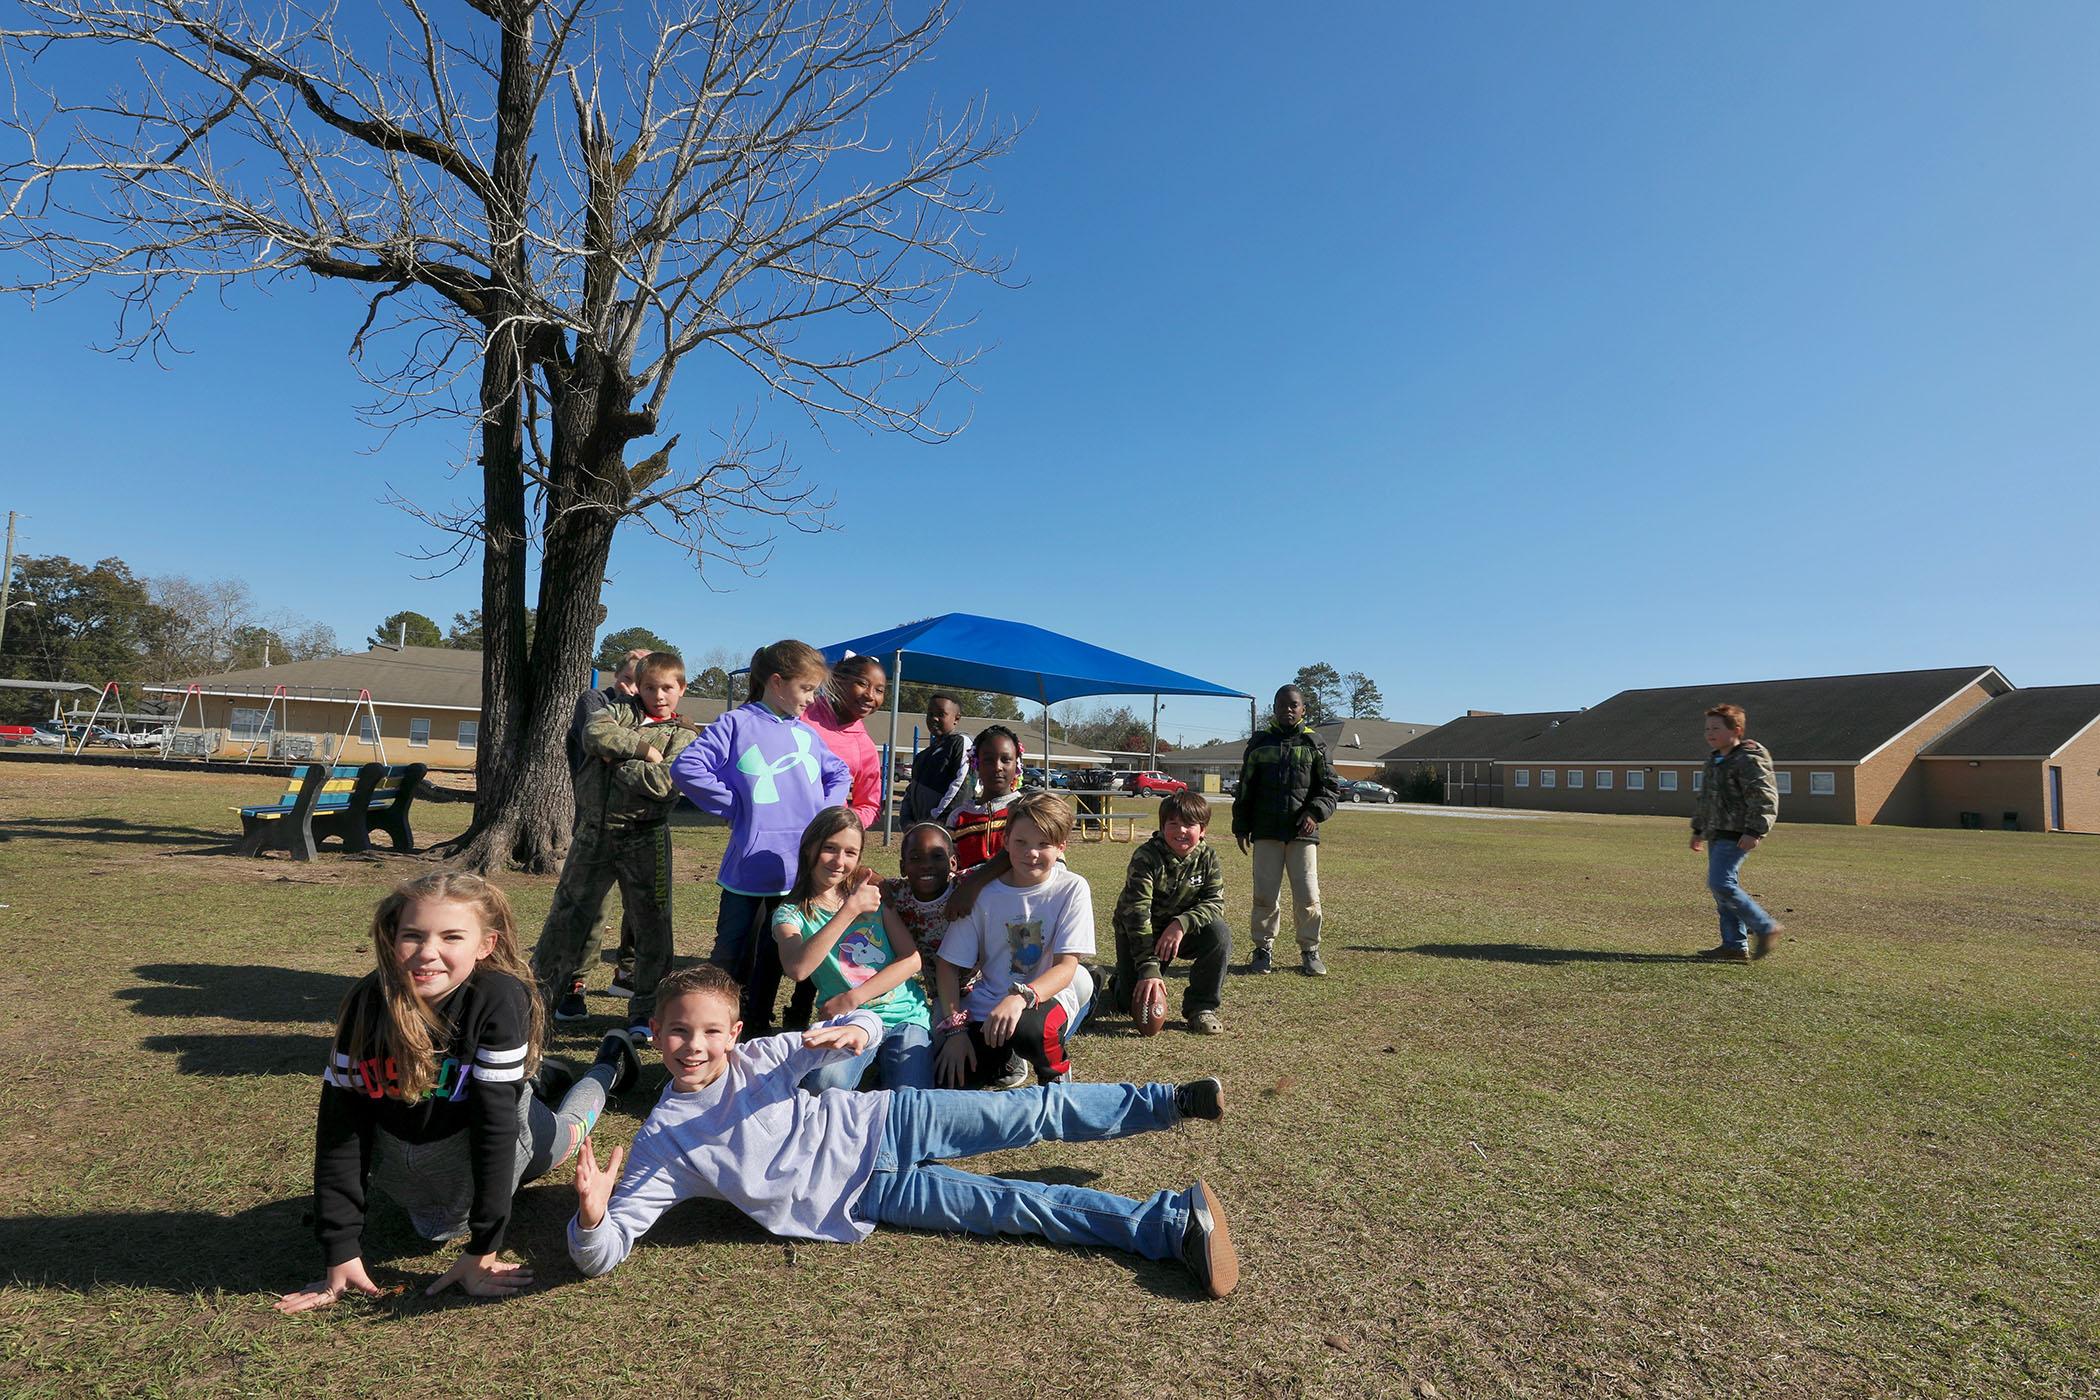 QUE kids enjoy recess.